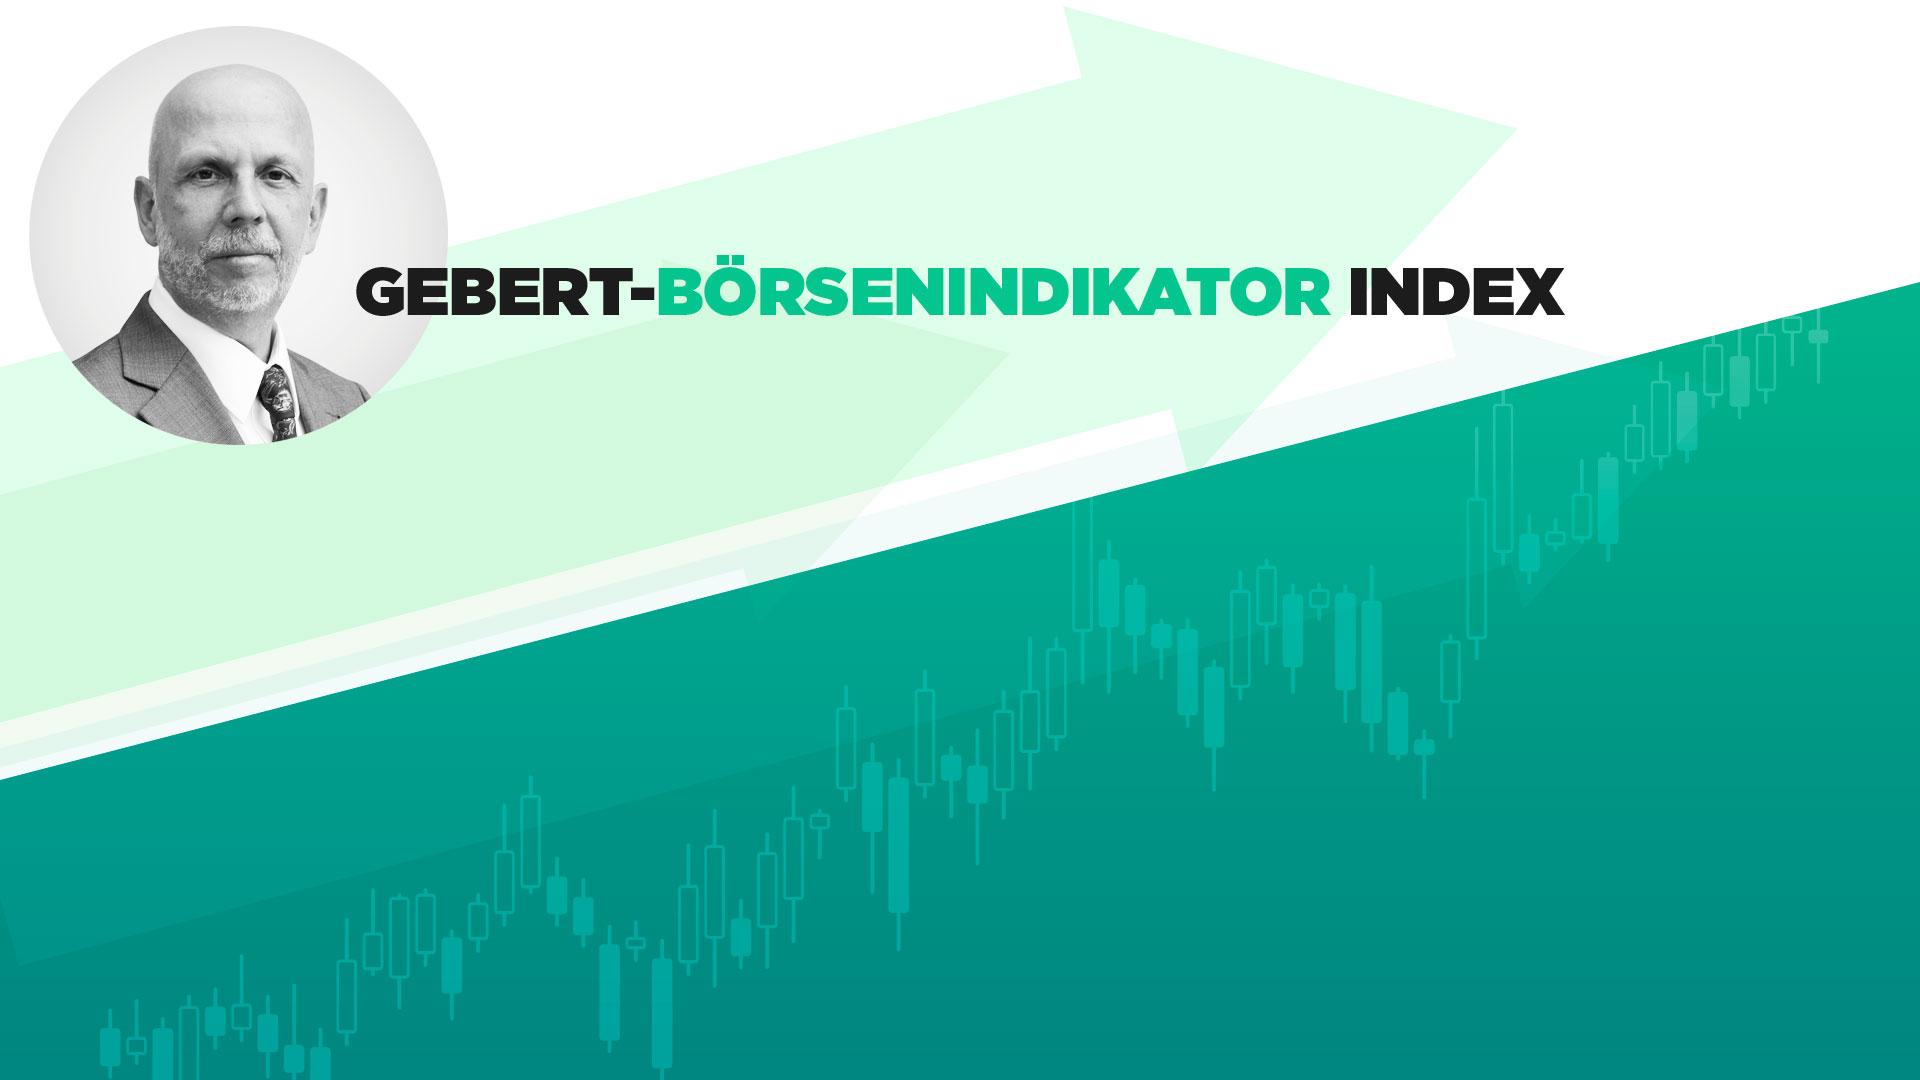 TSI und Gebert-Indikator: Eine starke Kombination